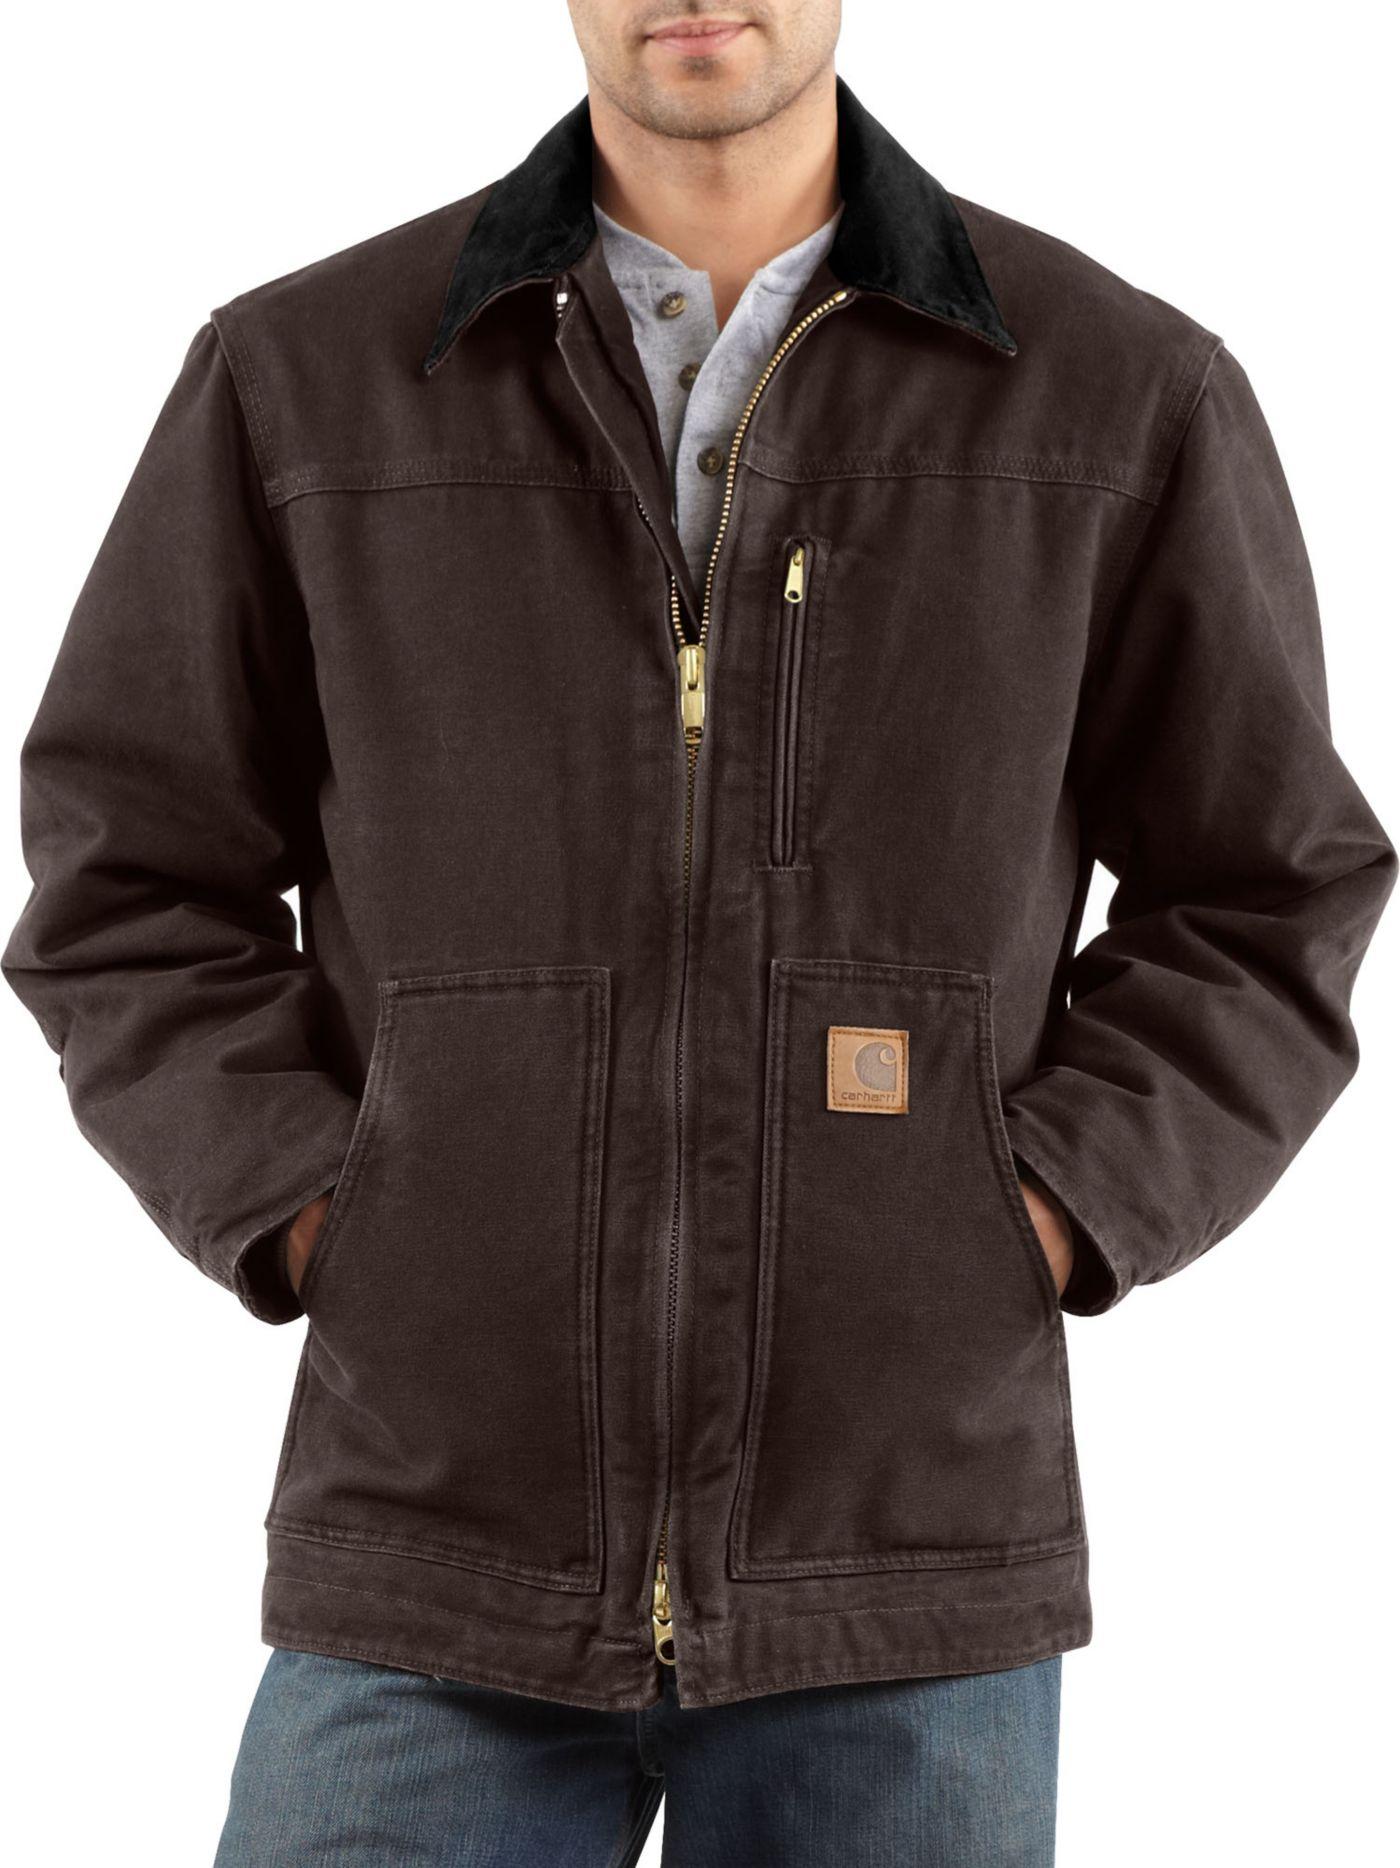 Carhartt Men's Sandstone Ridge Coat - Big & Tall